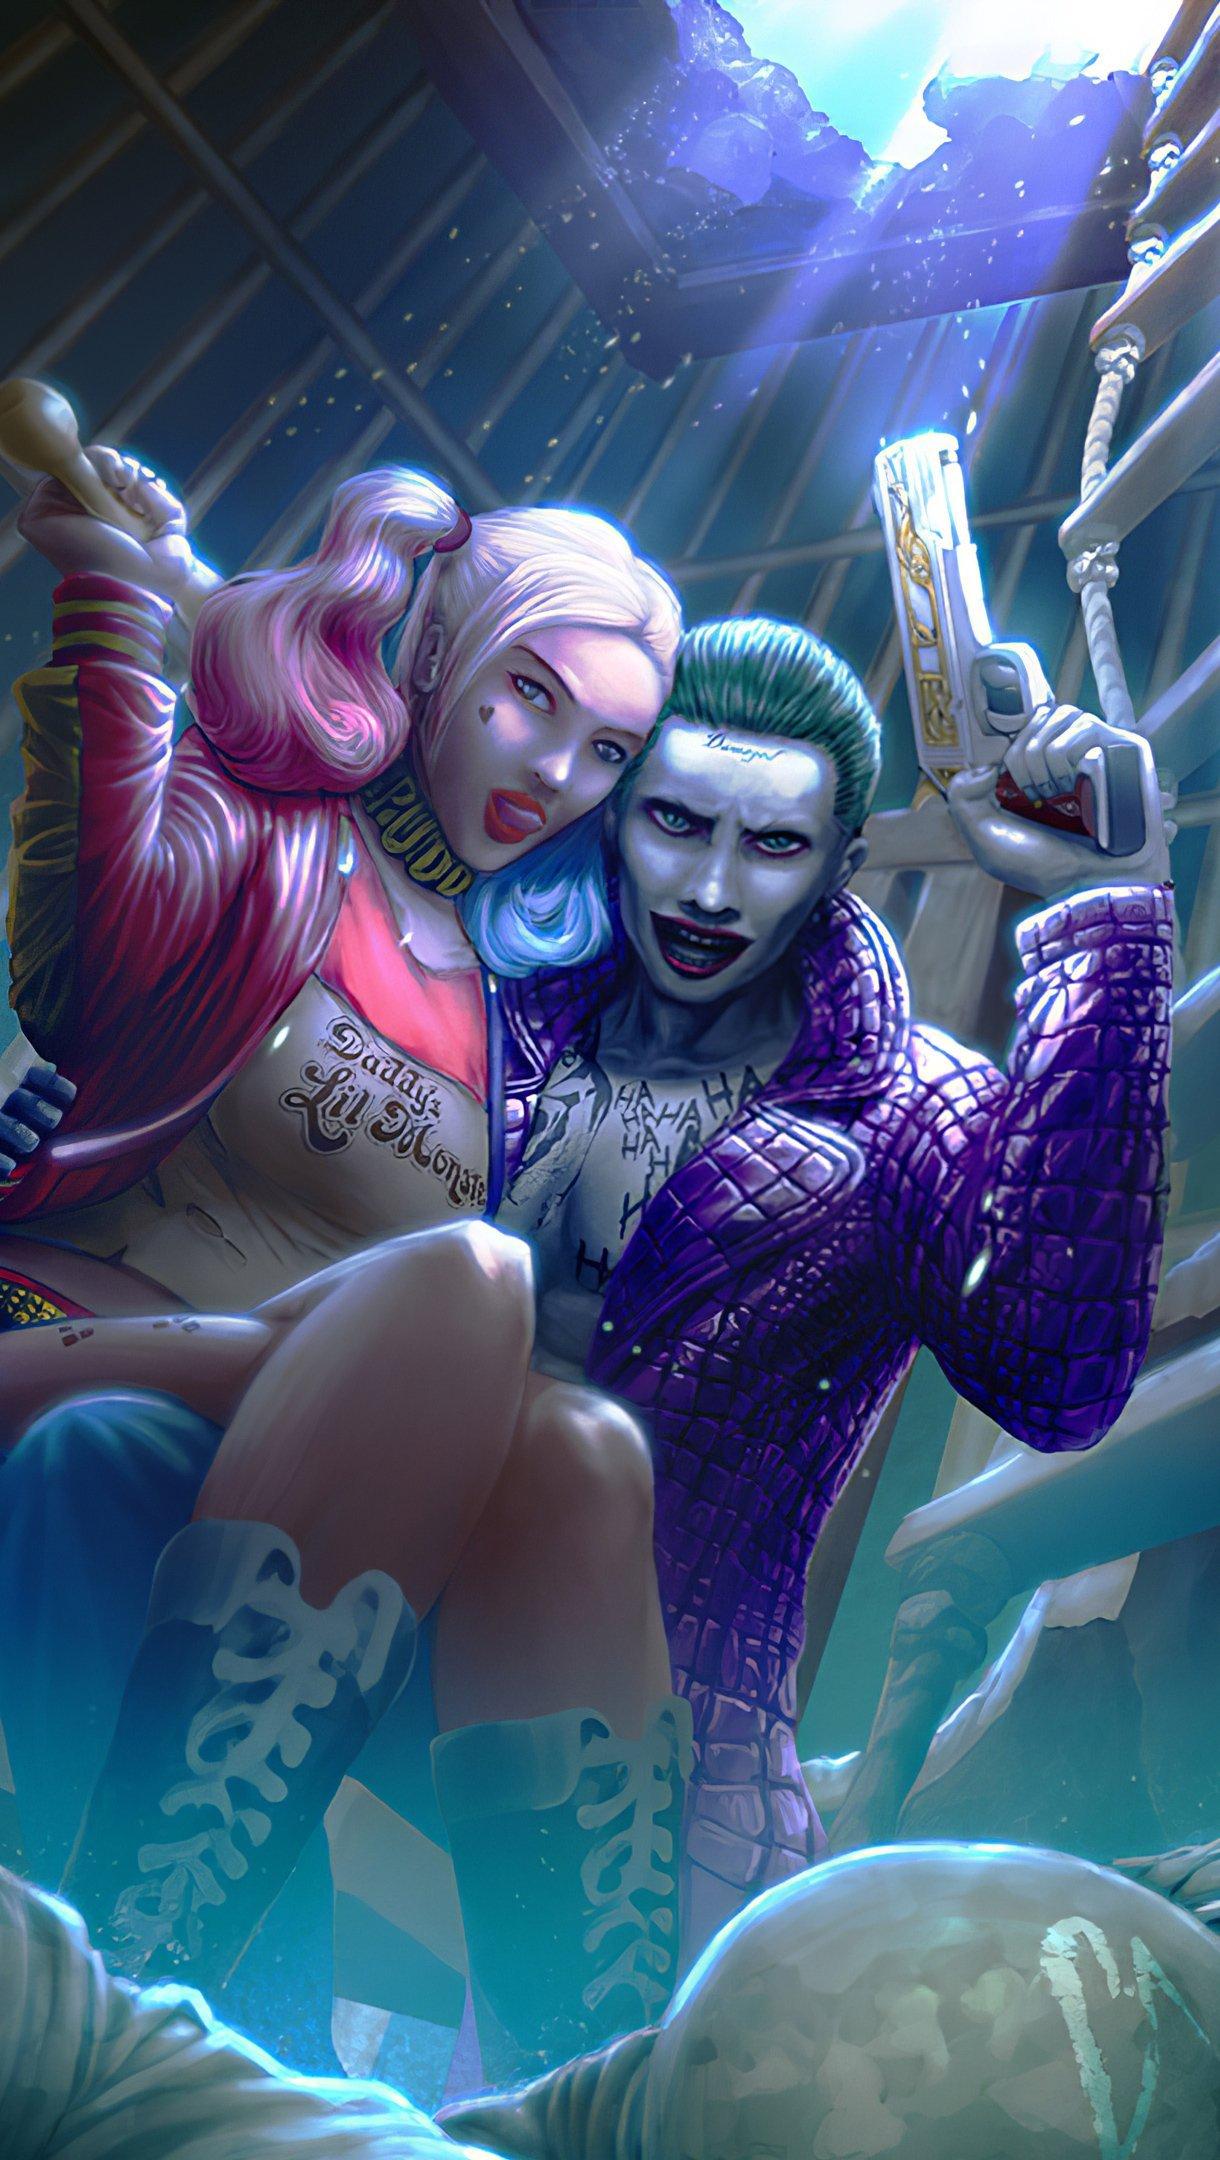 Wallpaper Harley Quinn and Joker Vertical